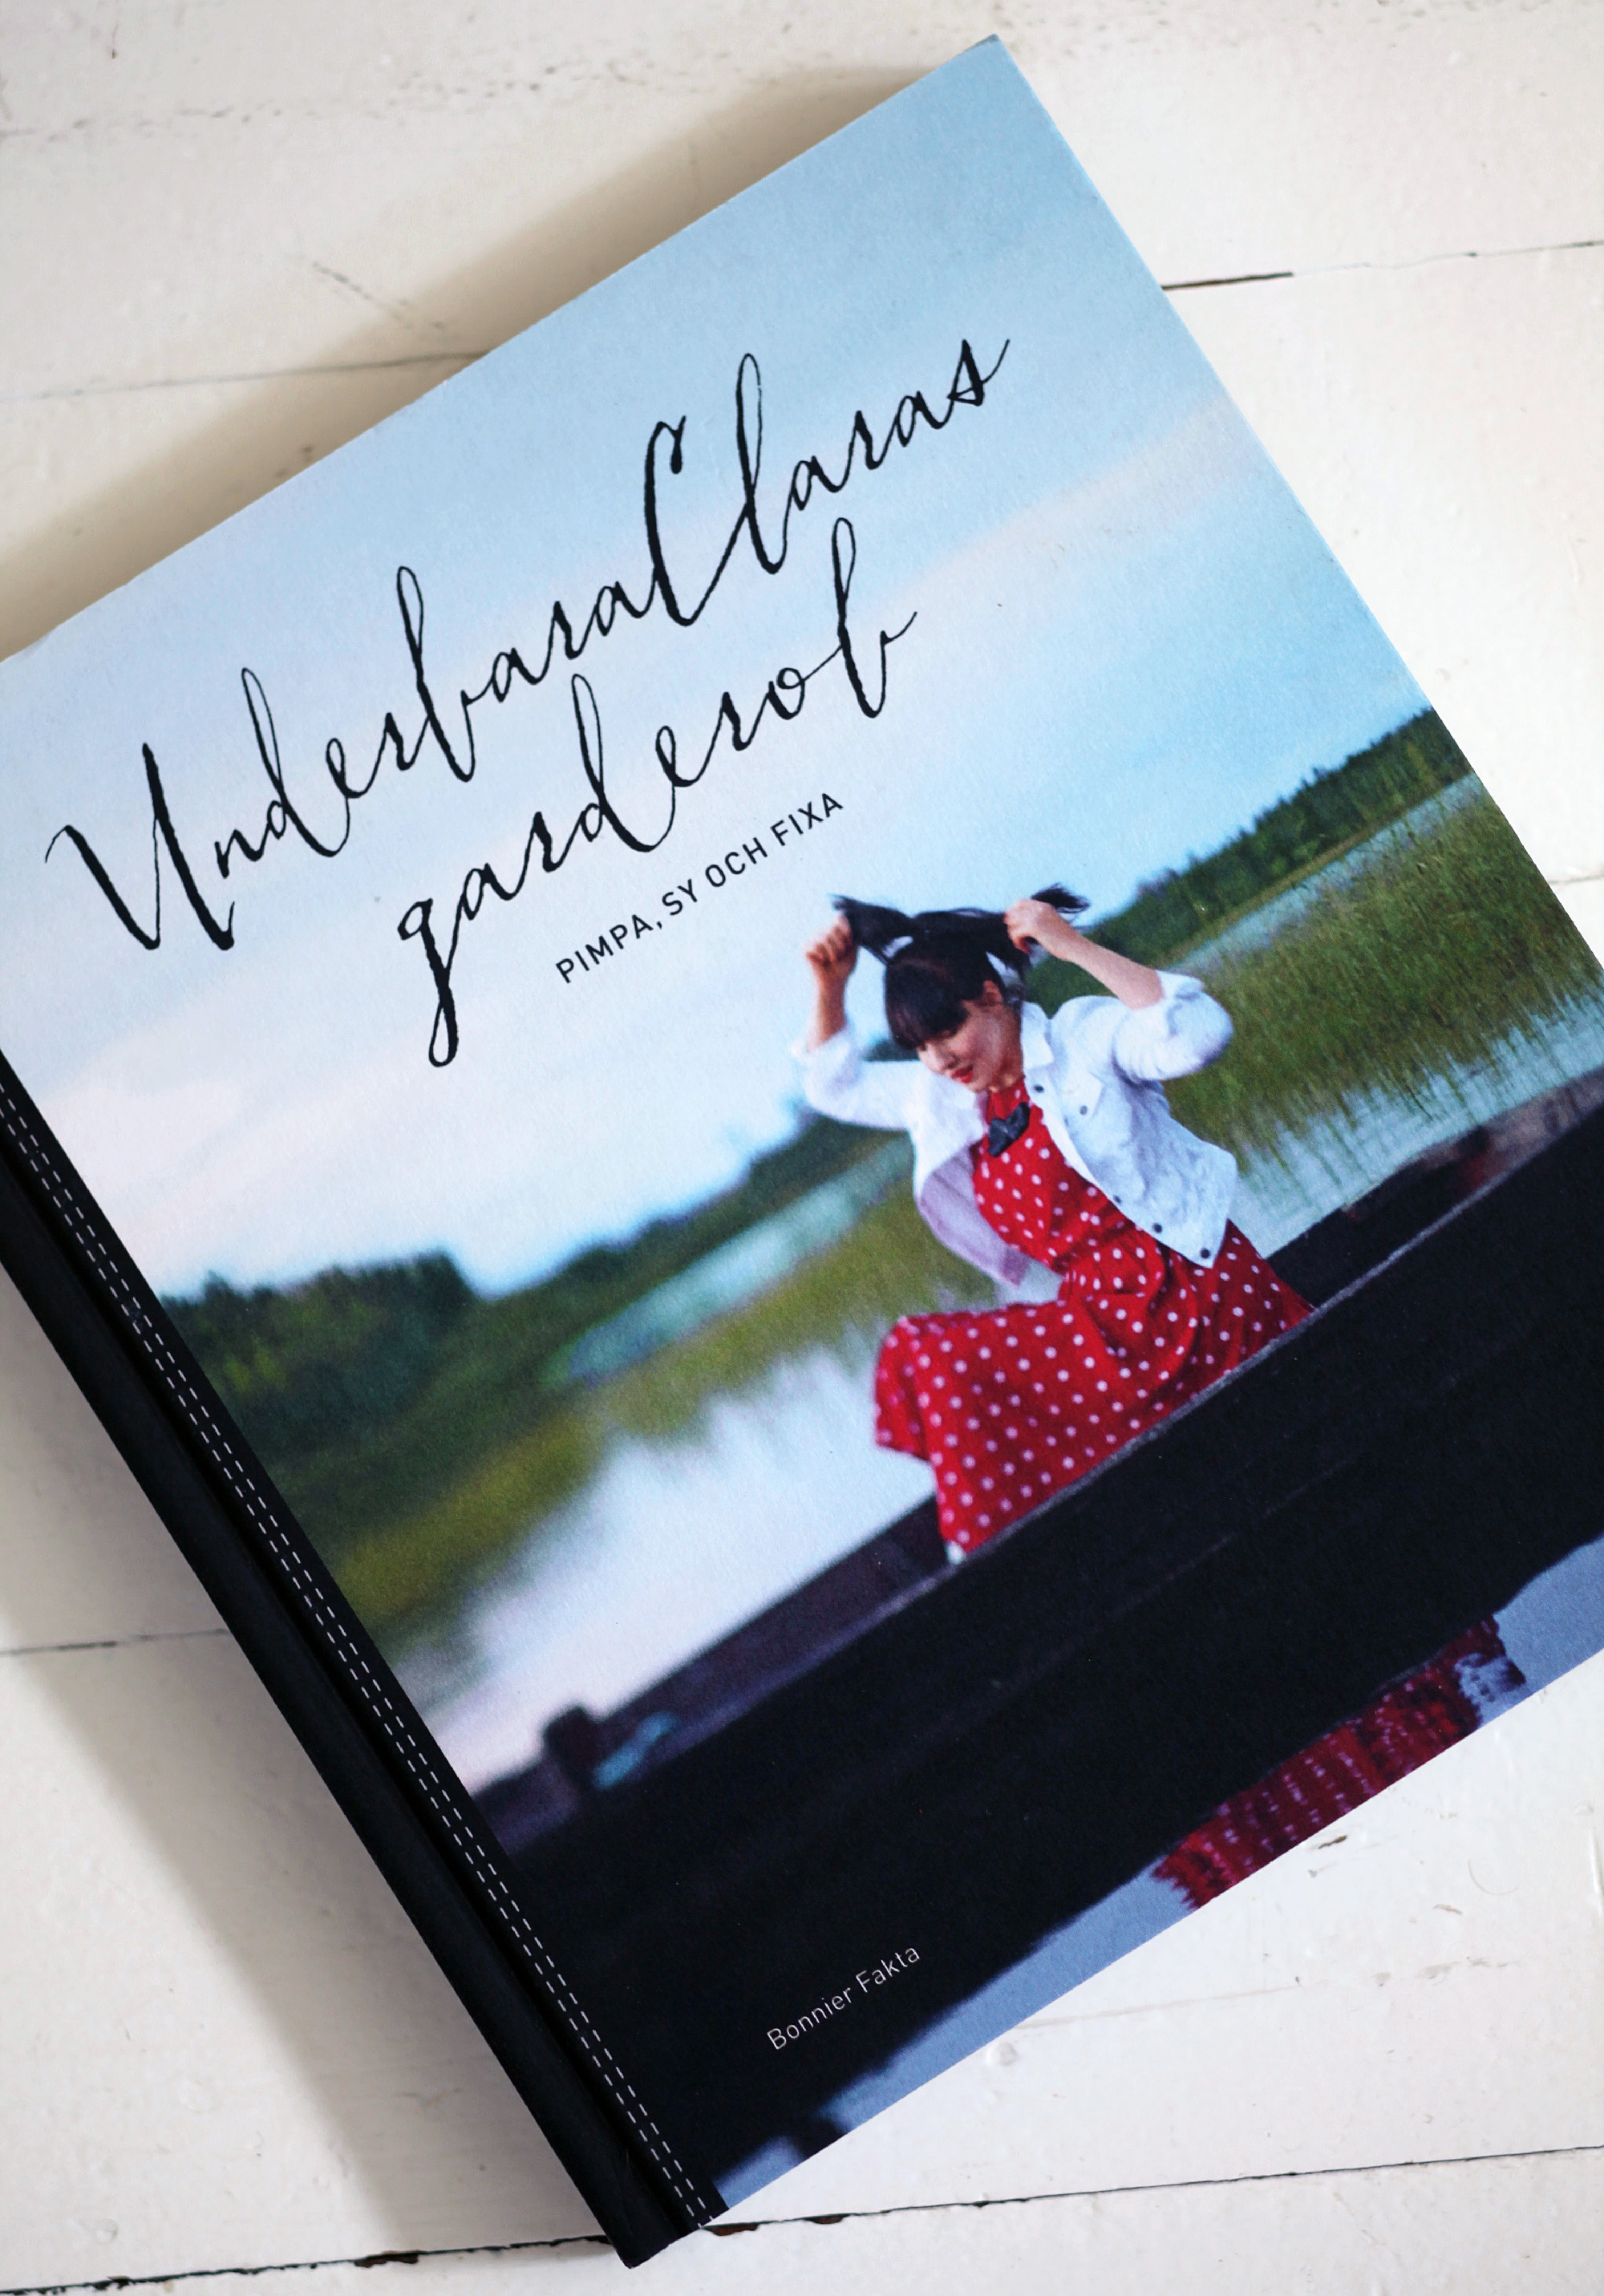 Anna_Lidström_Underbaraclaras_Garderob1.jpg